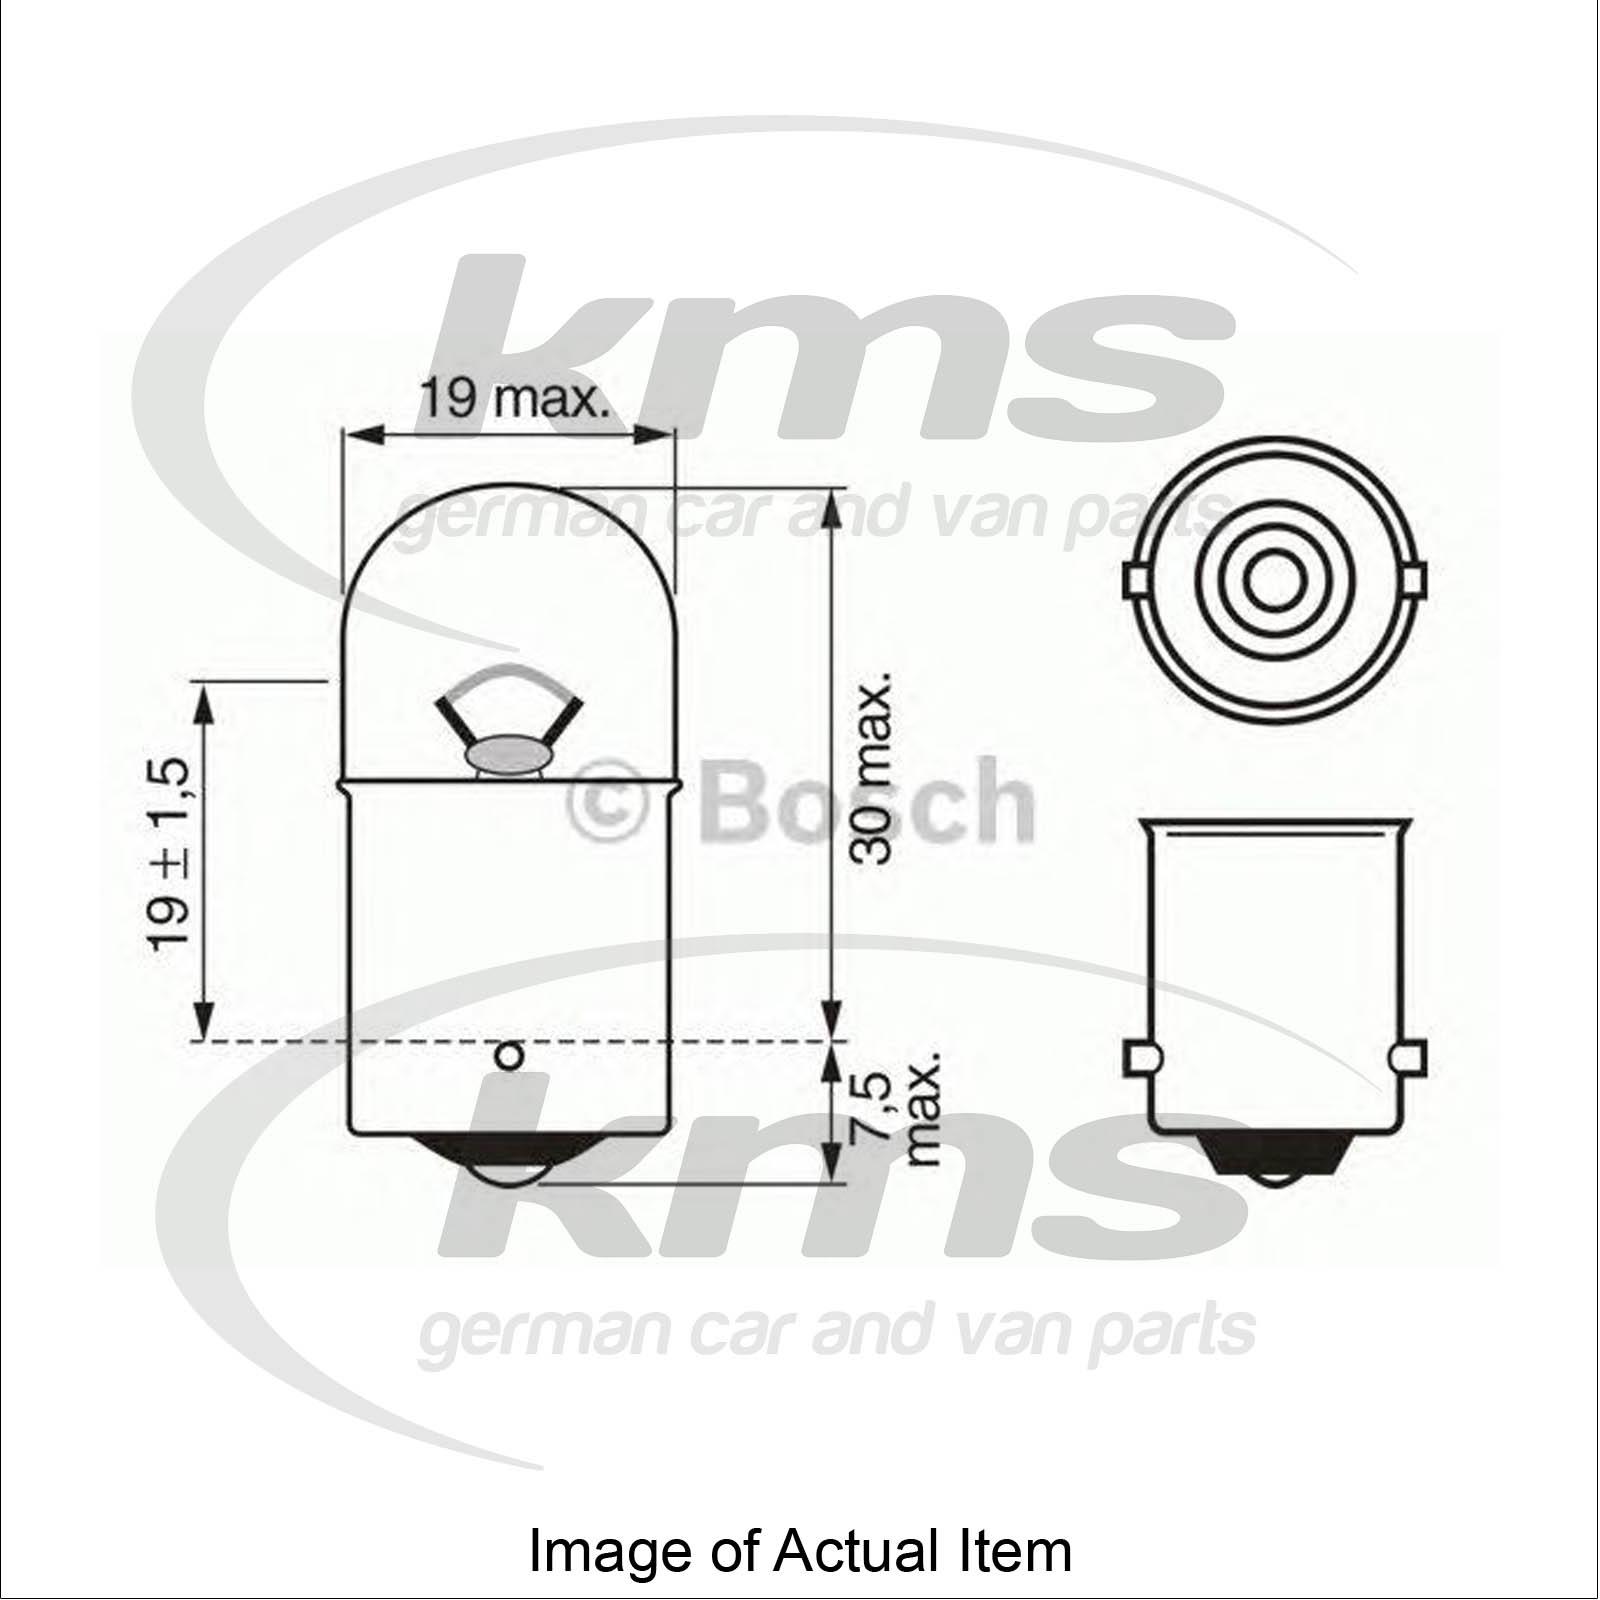 Bulb For Licence Plate Light Mercedes Sprinter 2 T Box 901 902 211 Cdi Box 10